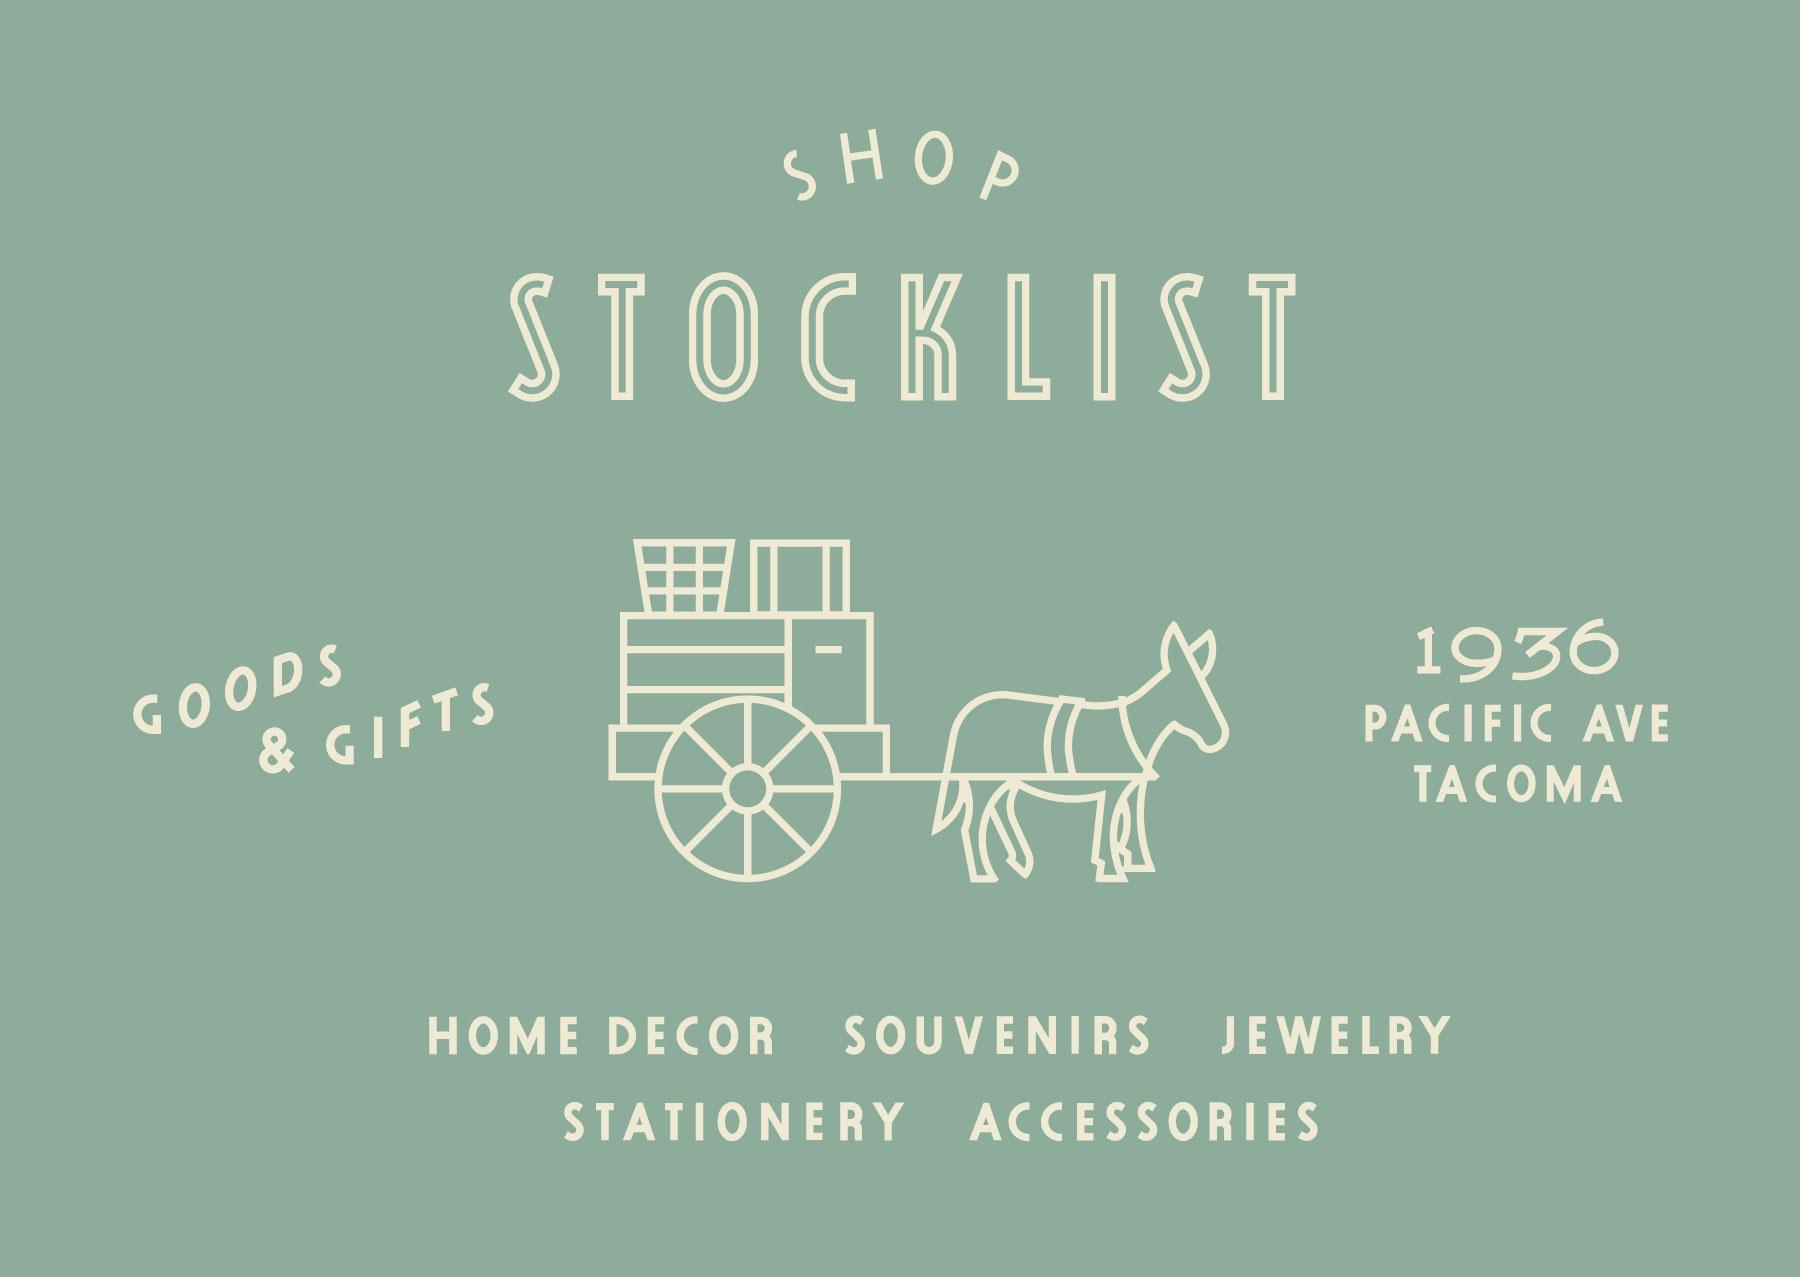 yrco_site_stocklist_1.jpg